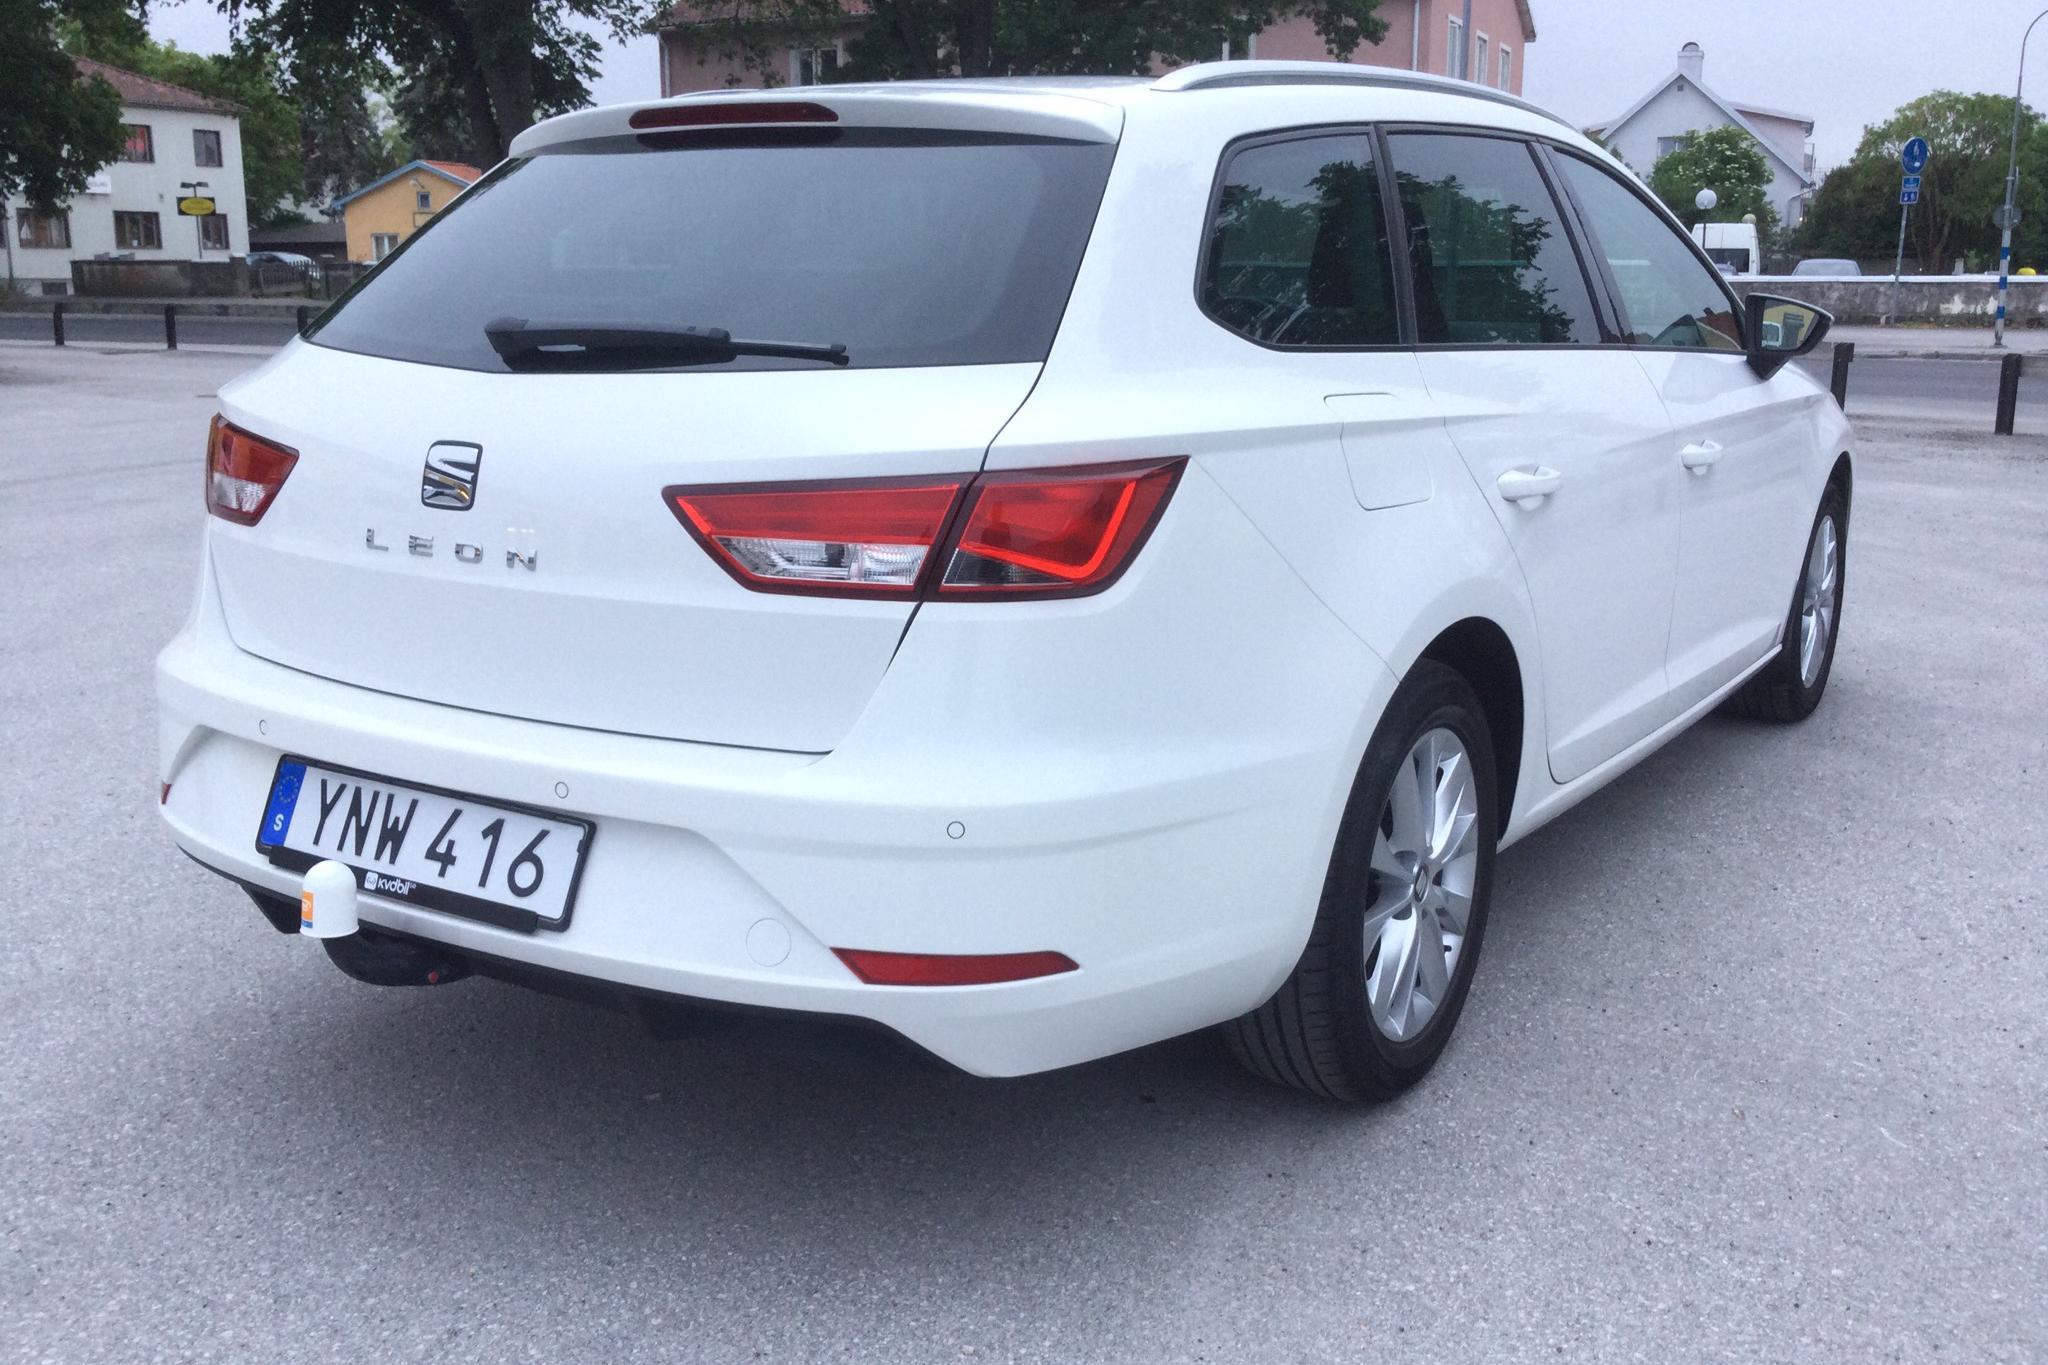 Seat Leon 1.2 TSI ST (110hk) - 26 680 km - Manual - white - 2018